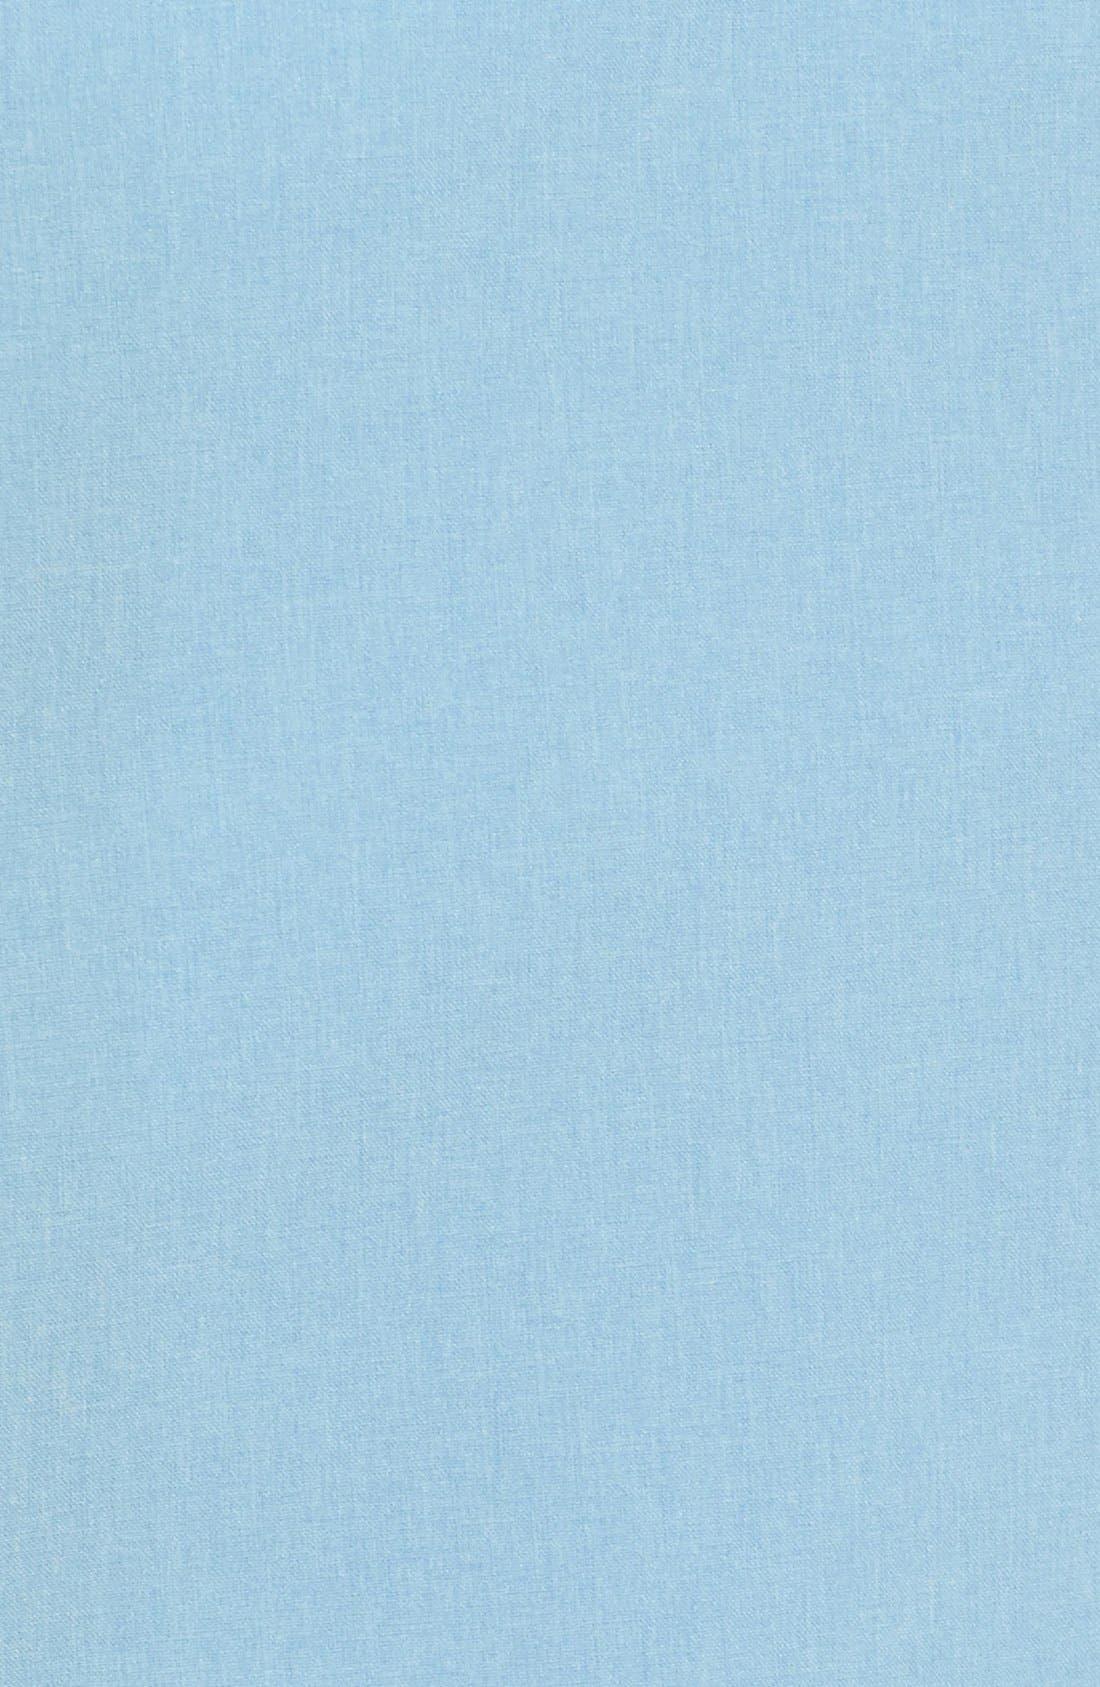 8 Inch Performance Breaker Shorts,                             Alternate thumbnail 27, color,